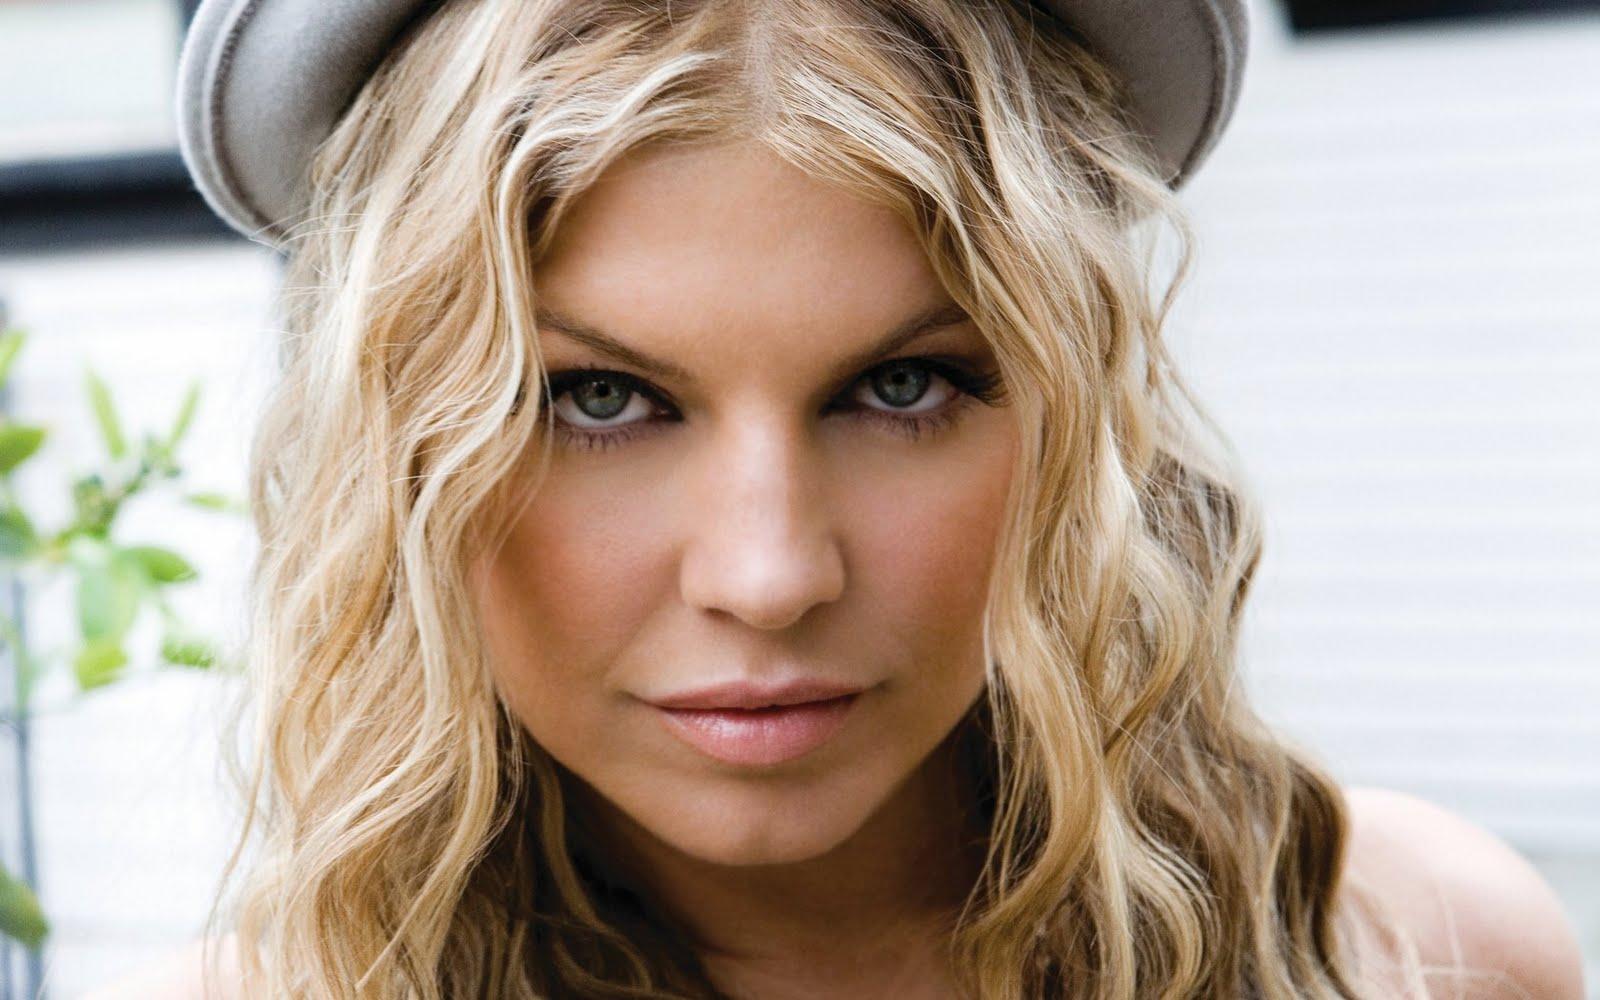 http://2.bp.blogspot.com/-vV5Bf1Nf0mE/TY7zZkJLyKI/AAAAAAAAMAM/clamlUJi1j4/s1600/american_singer_actress_fergie_wallpapers+%283%29.jpg